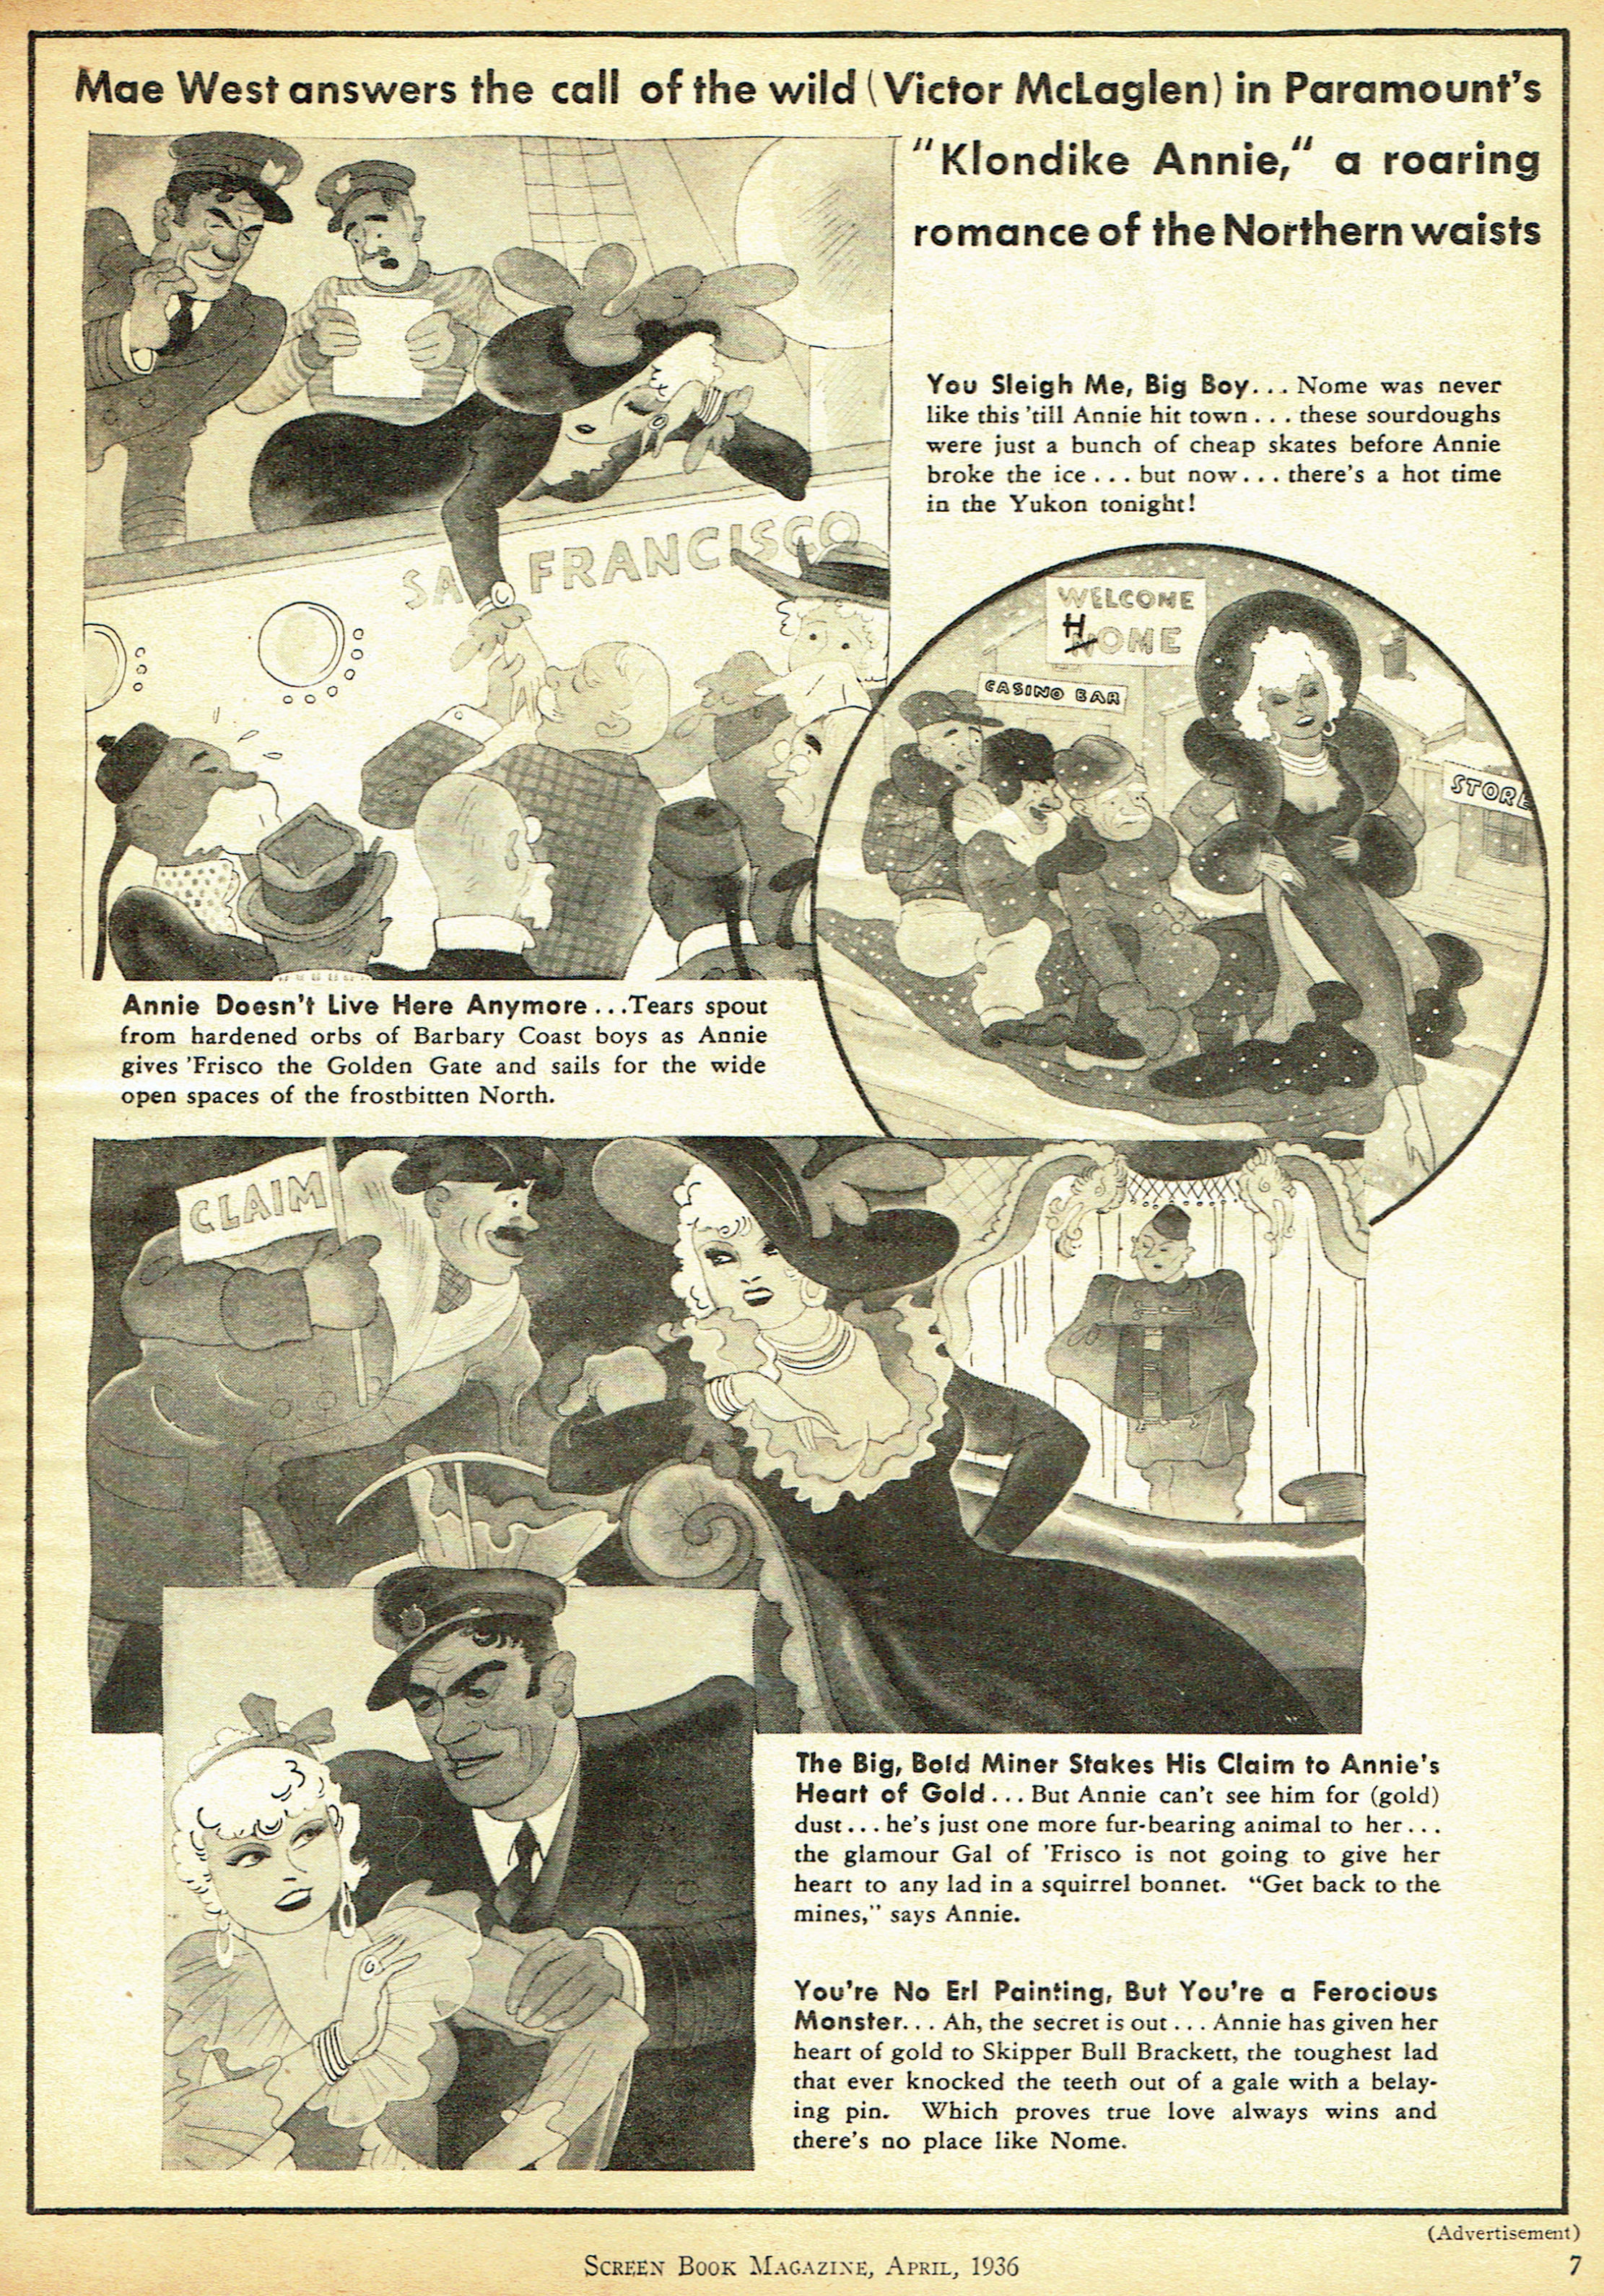 screen book april 1936c